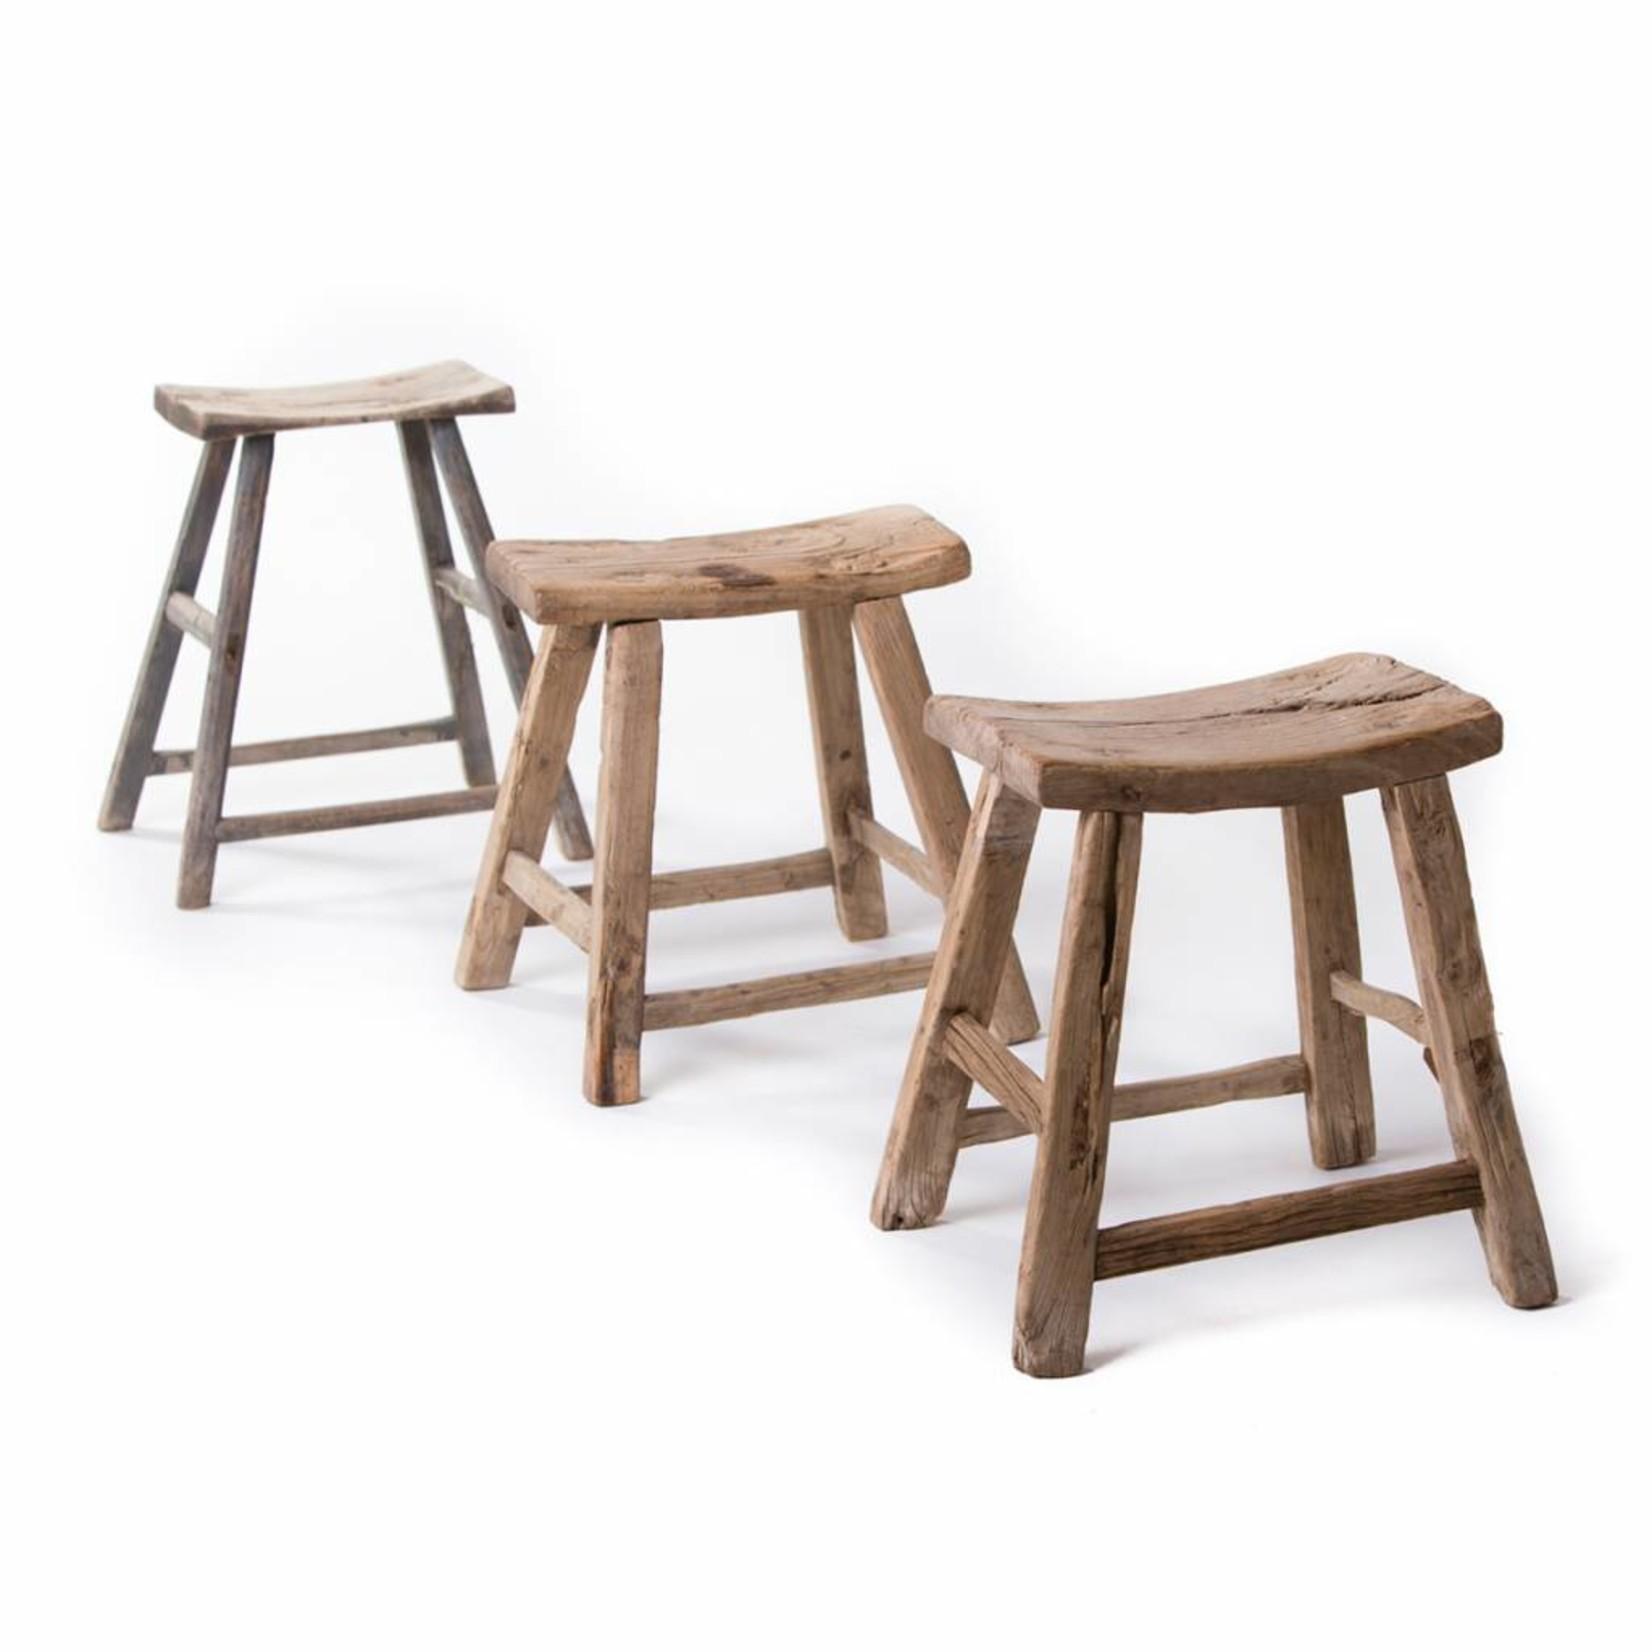 Old Chinese vintage wooden saddle stool